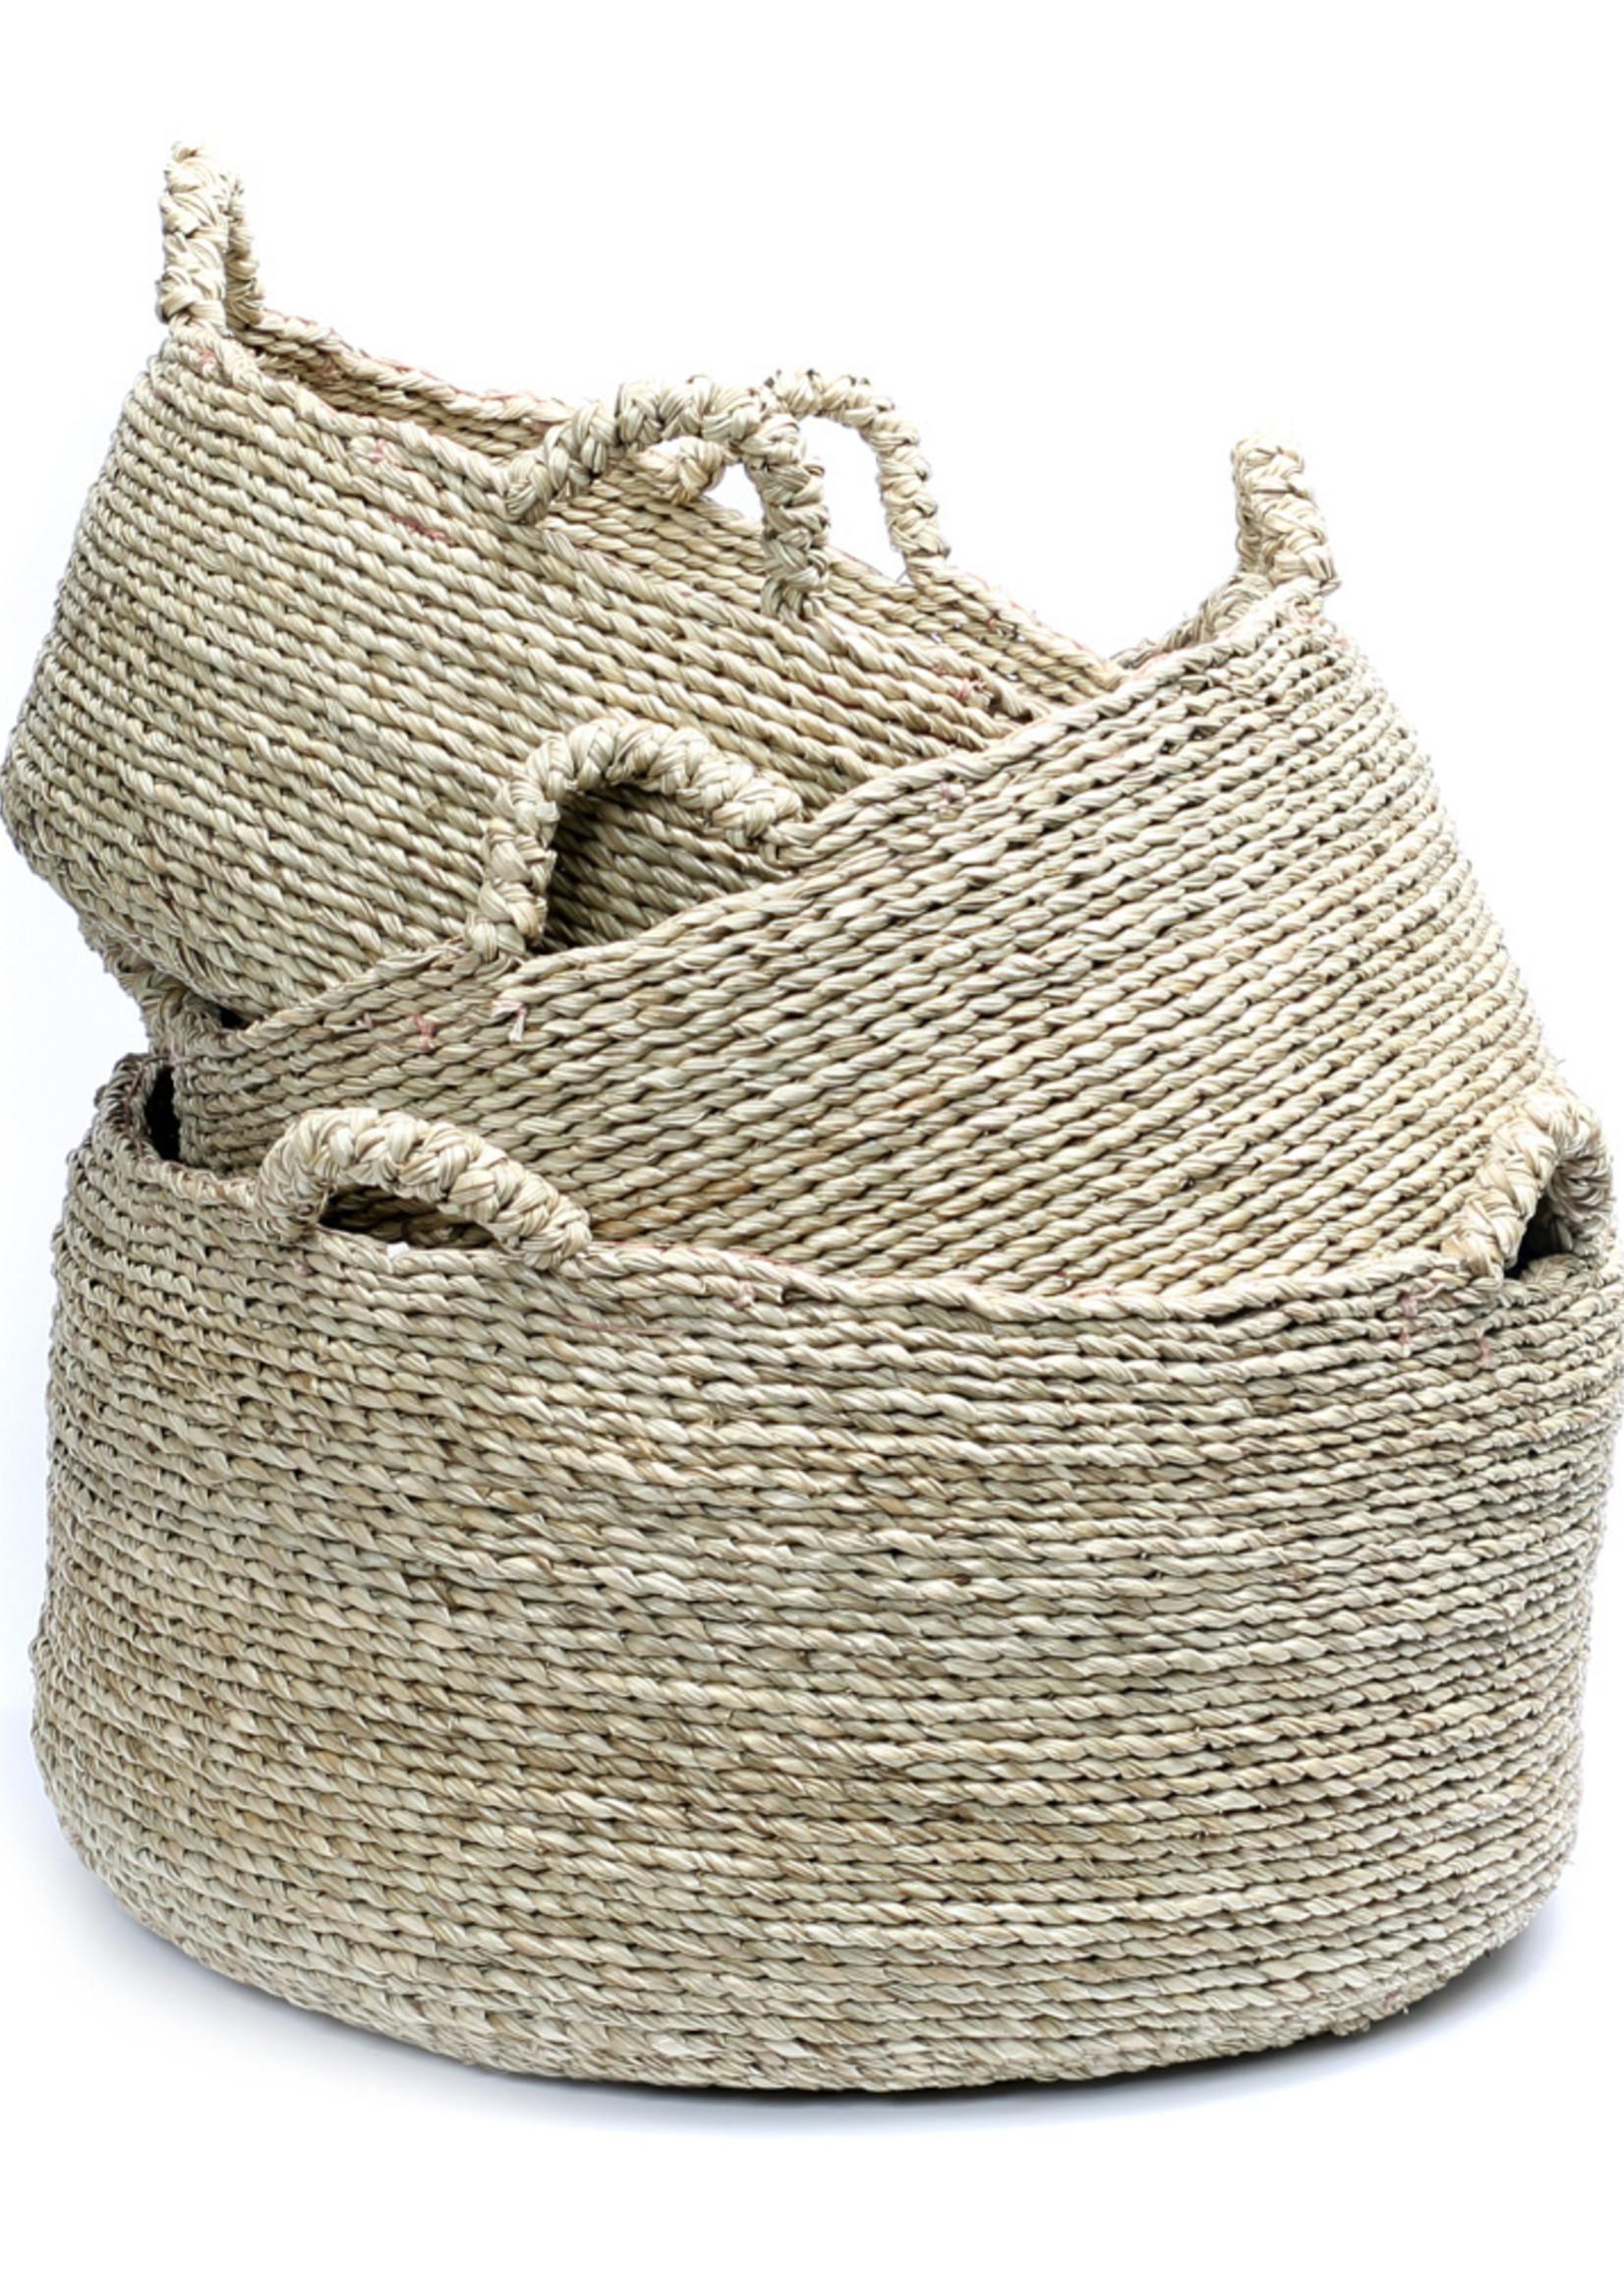 Les Quatre Mains Baskets - Natural - SET3